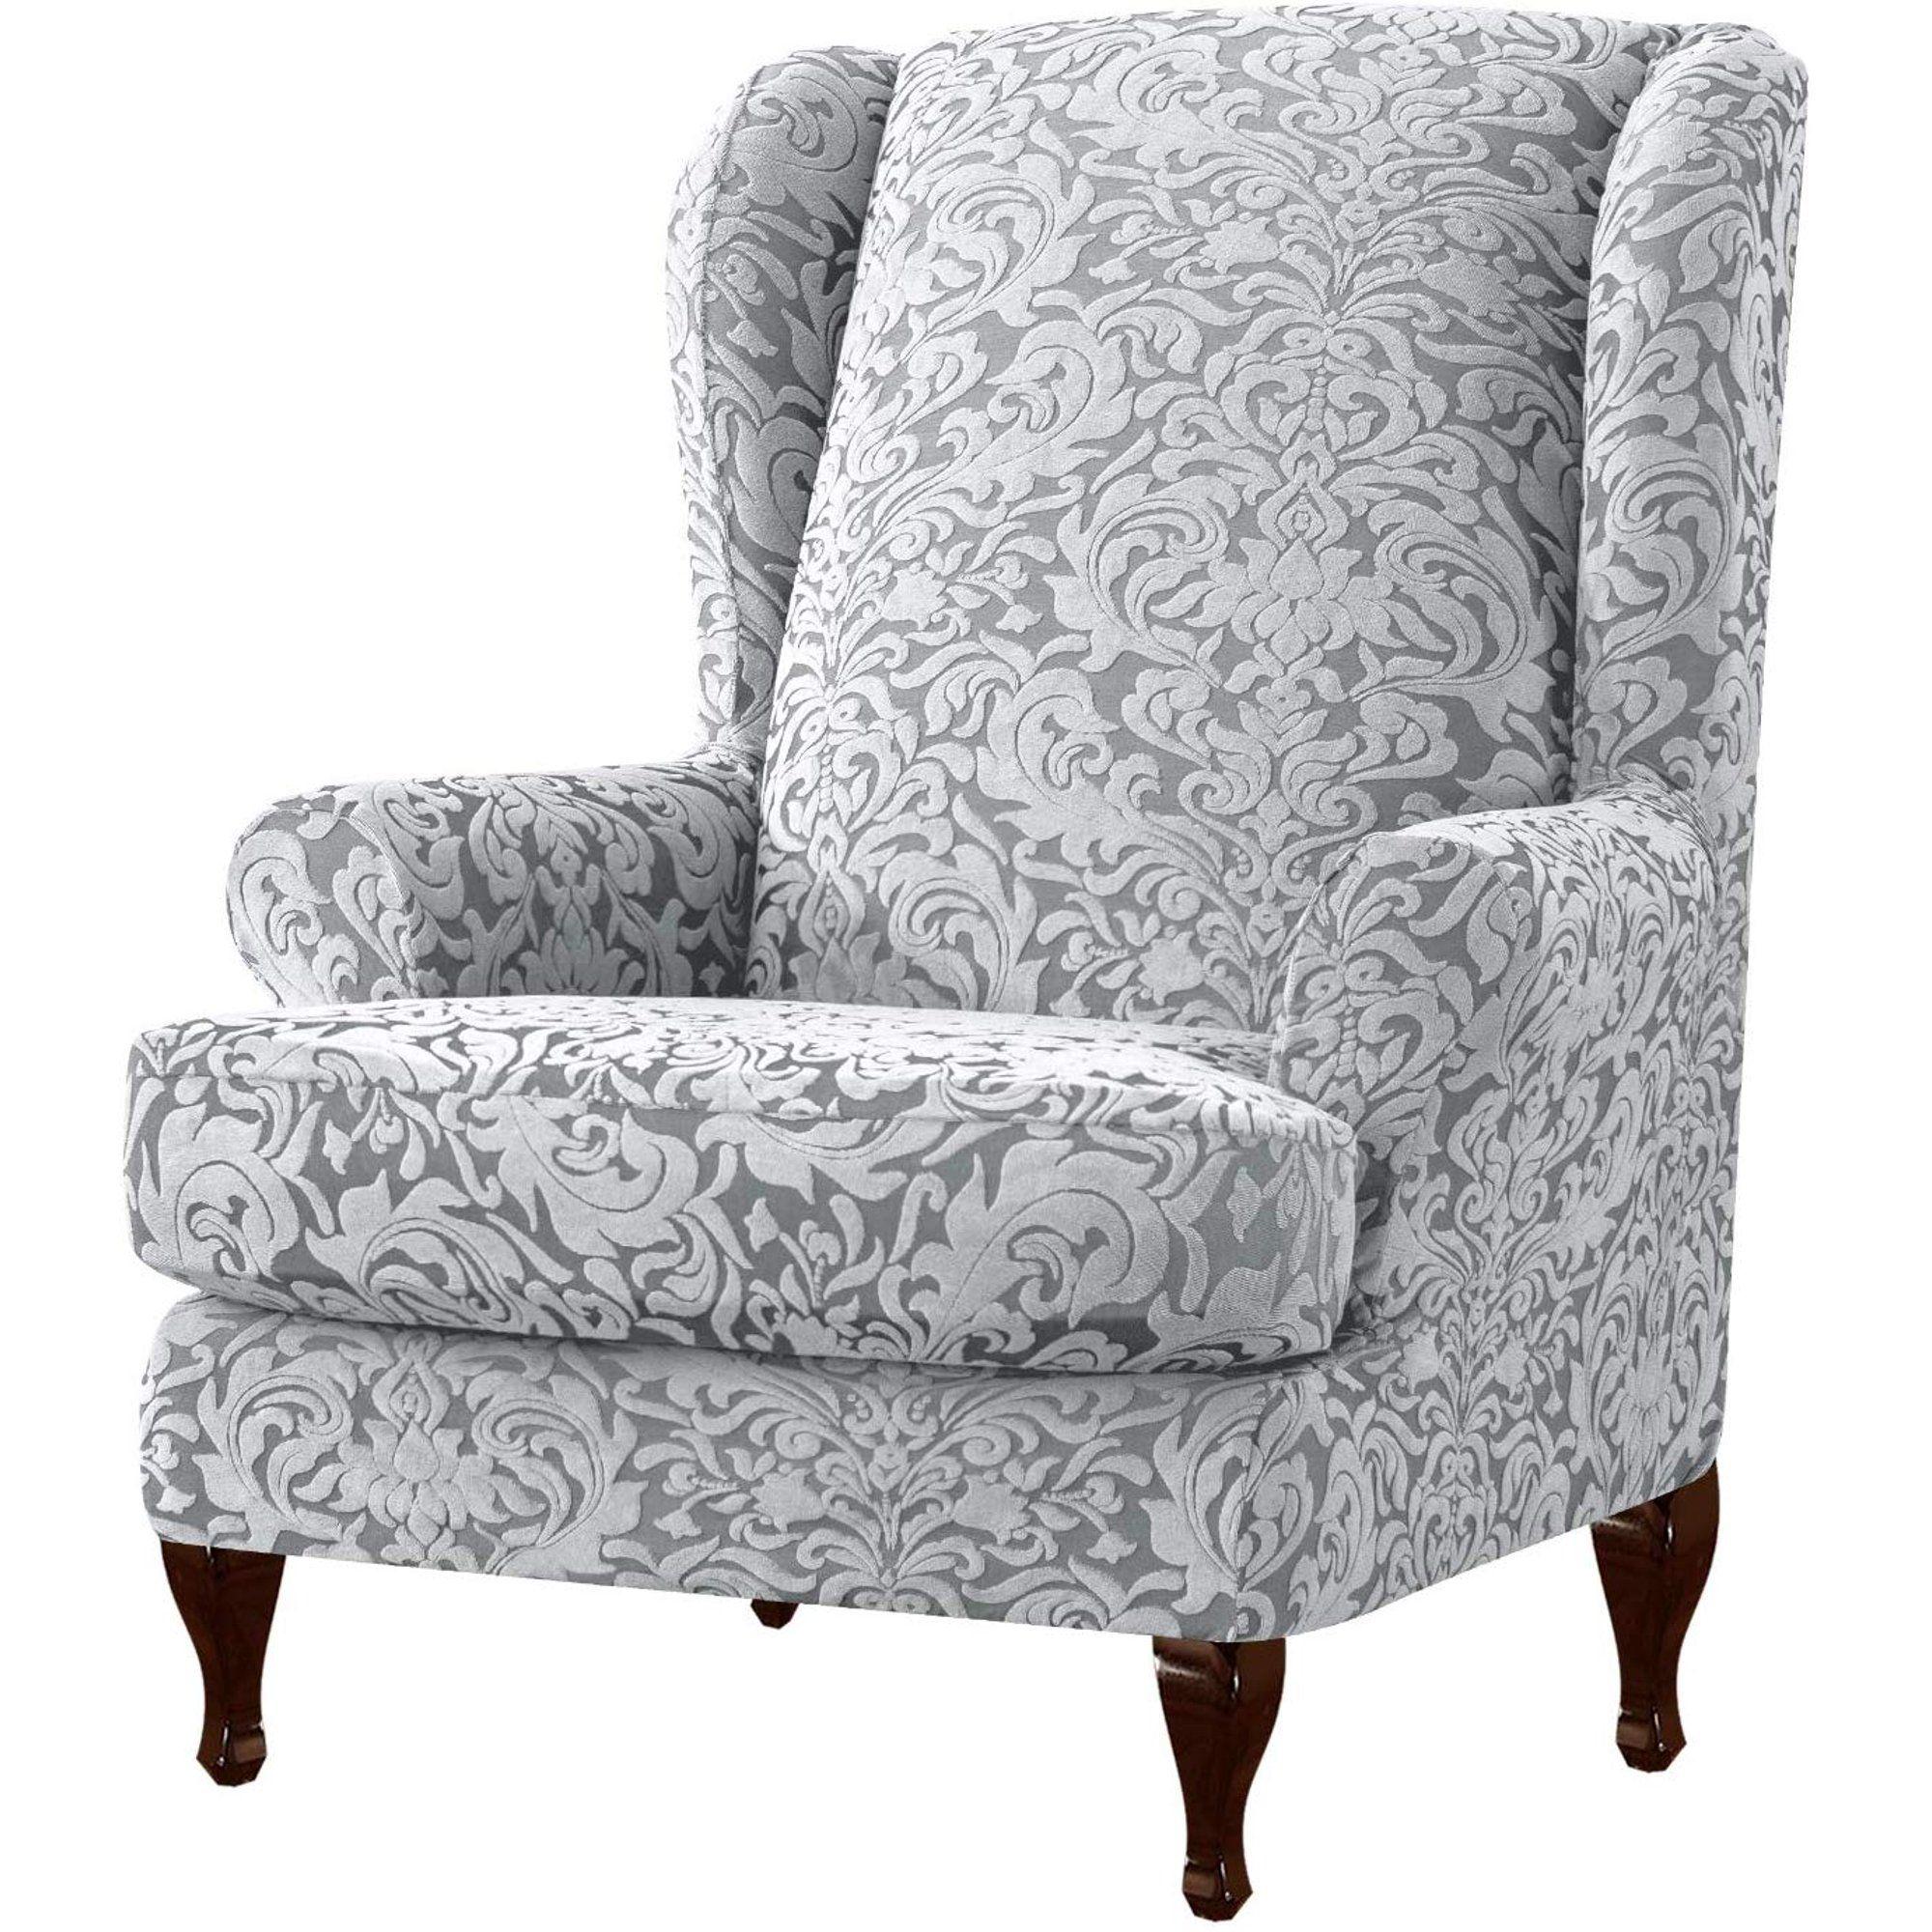 Subrtex Stretch 1Piece Jacquard Damask Wing Chair